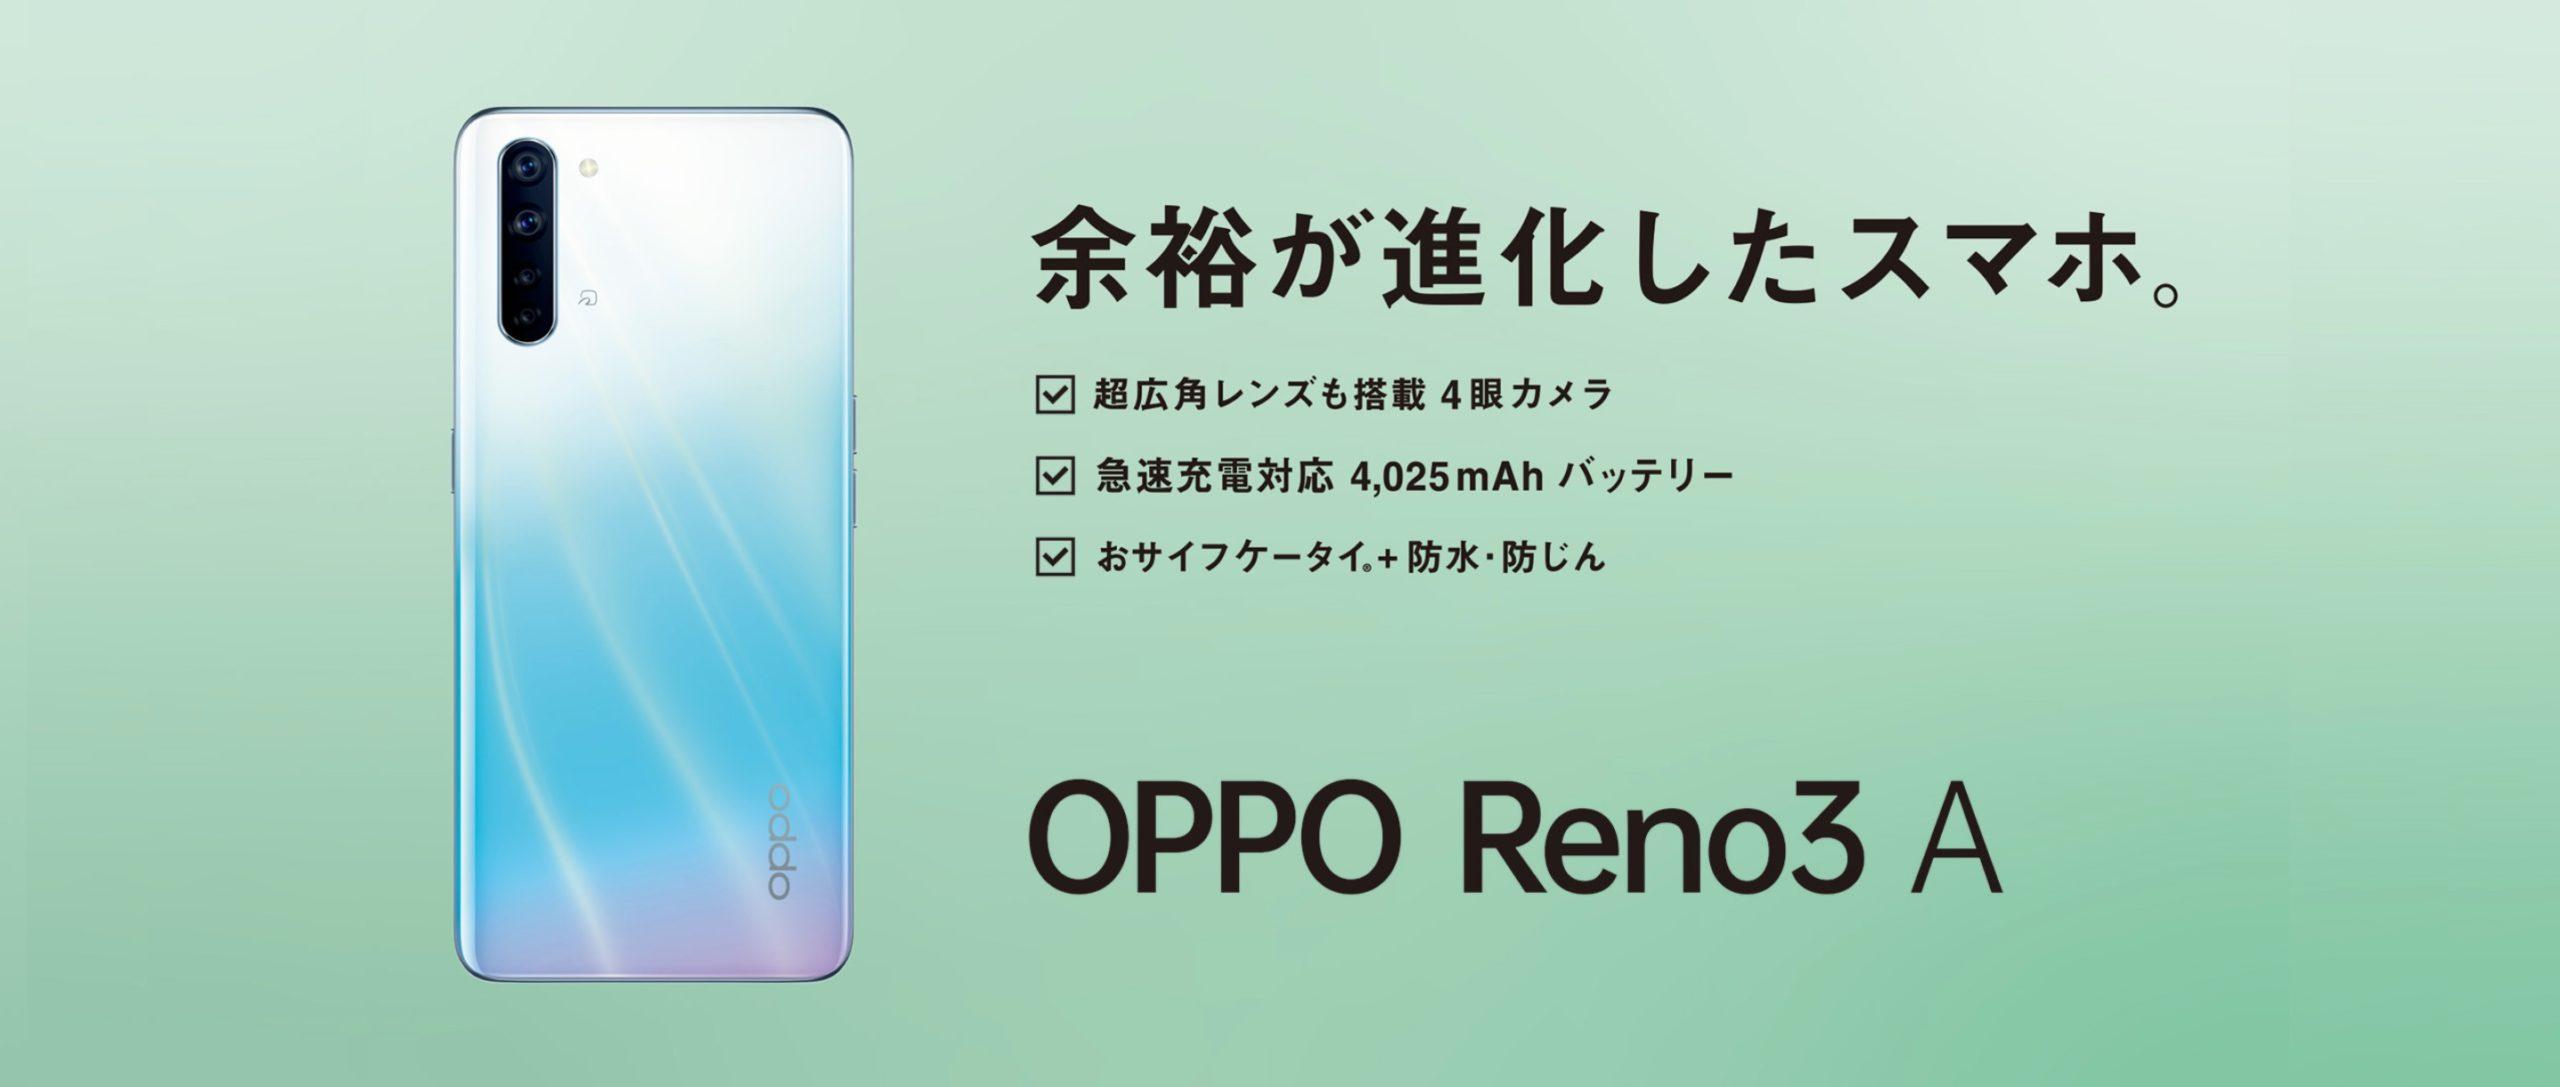 OPPO Reno3 A